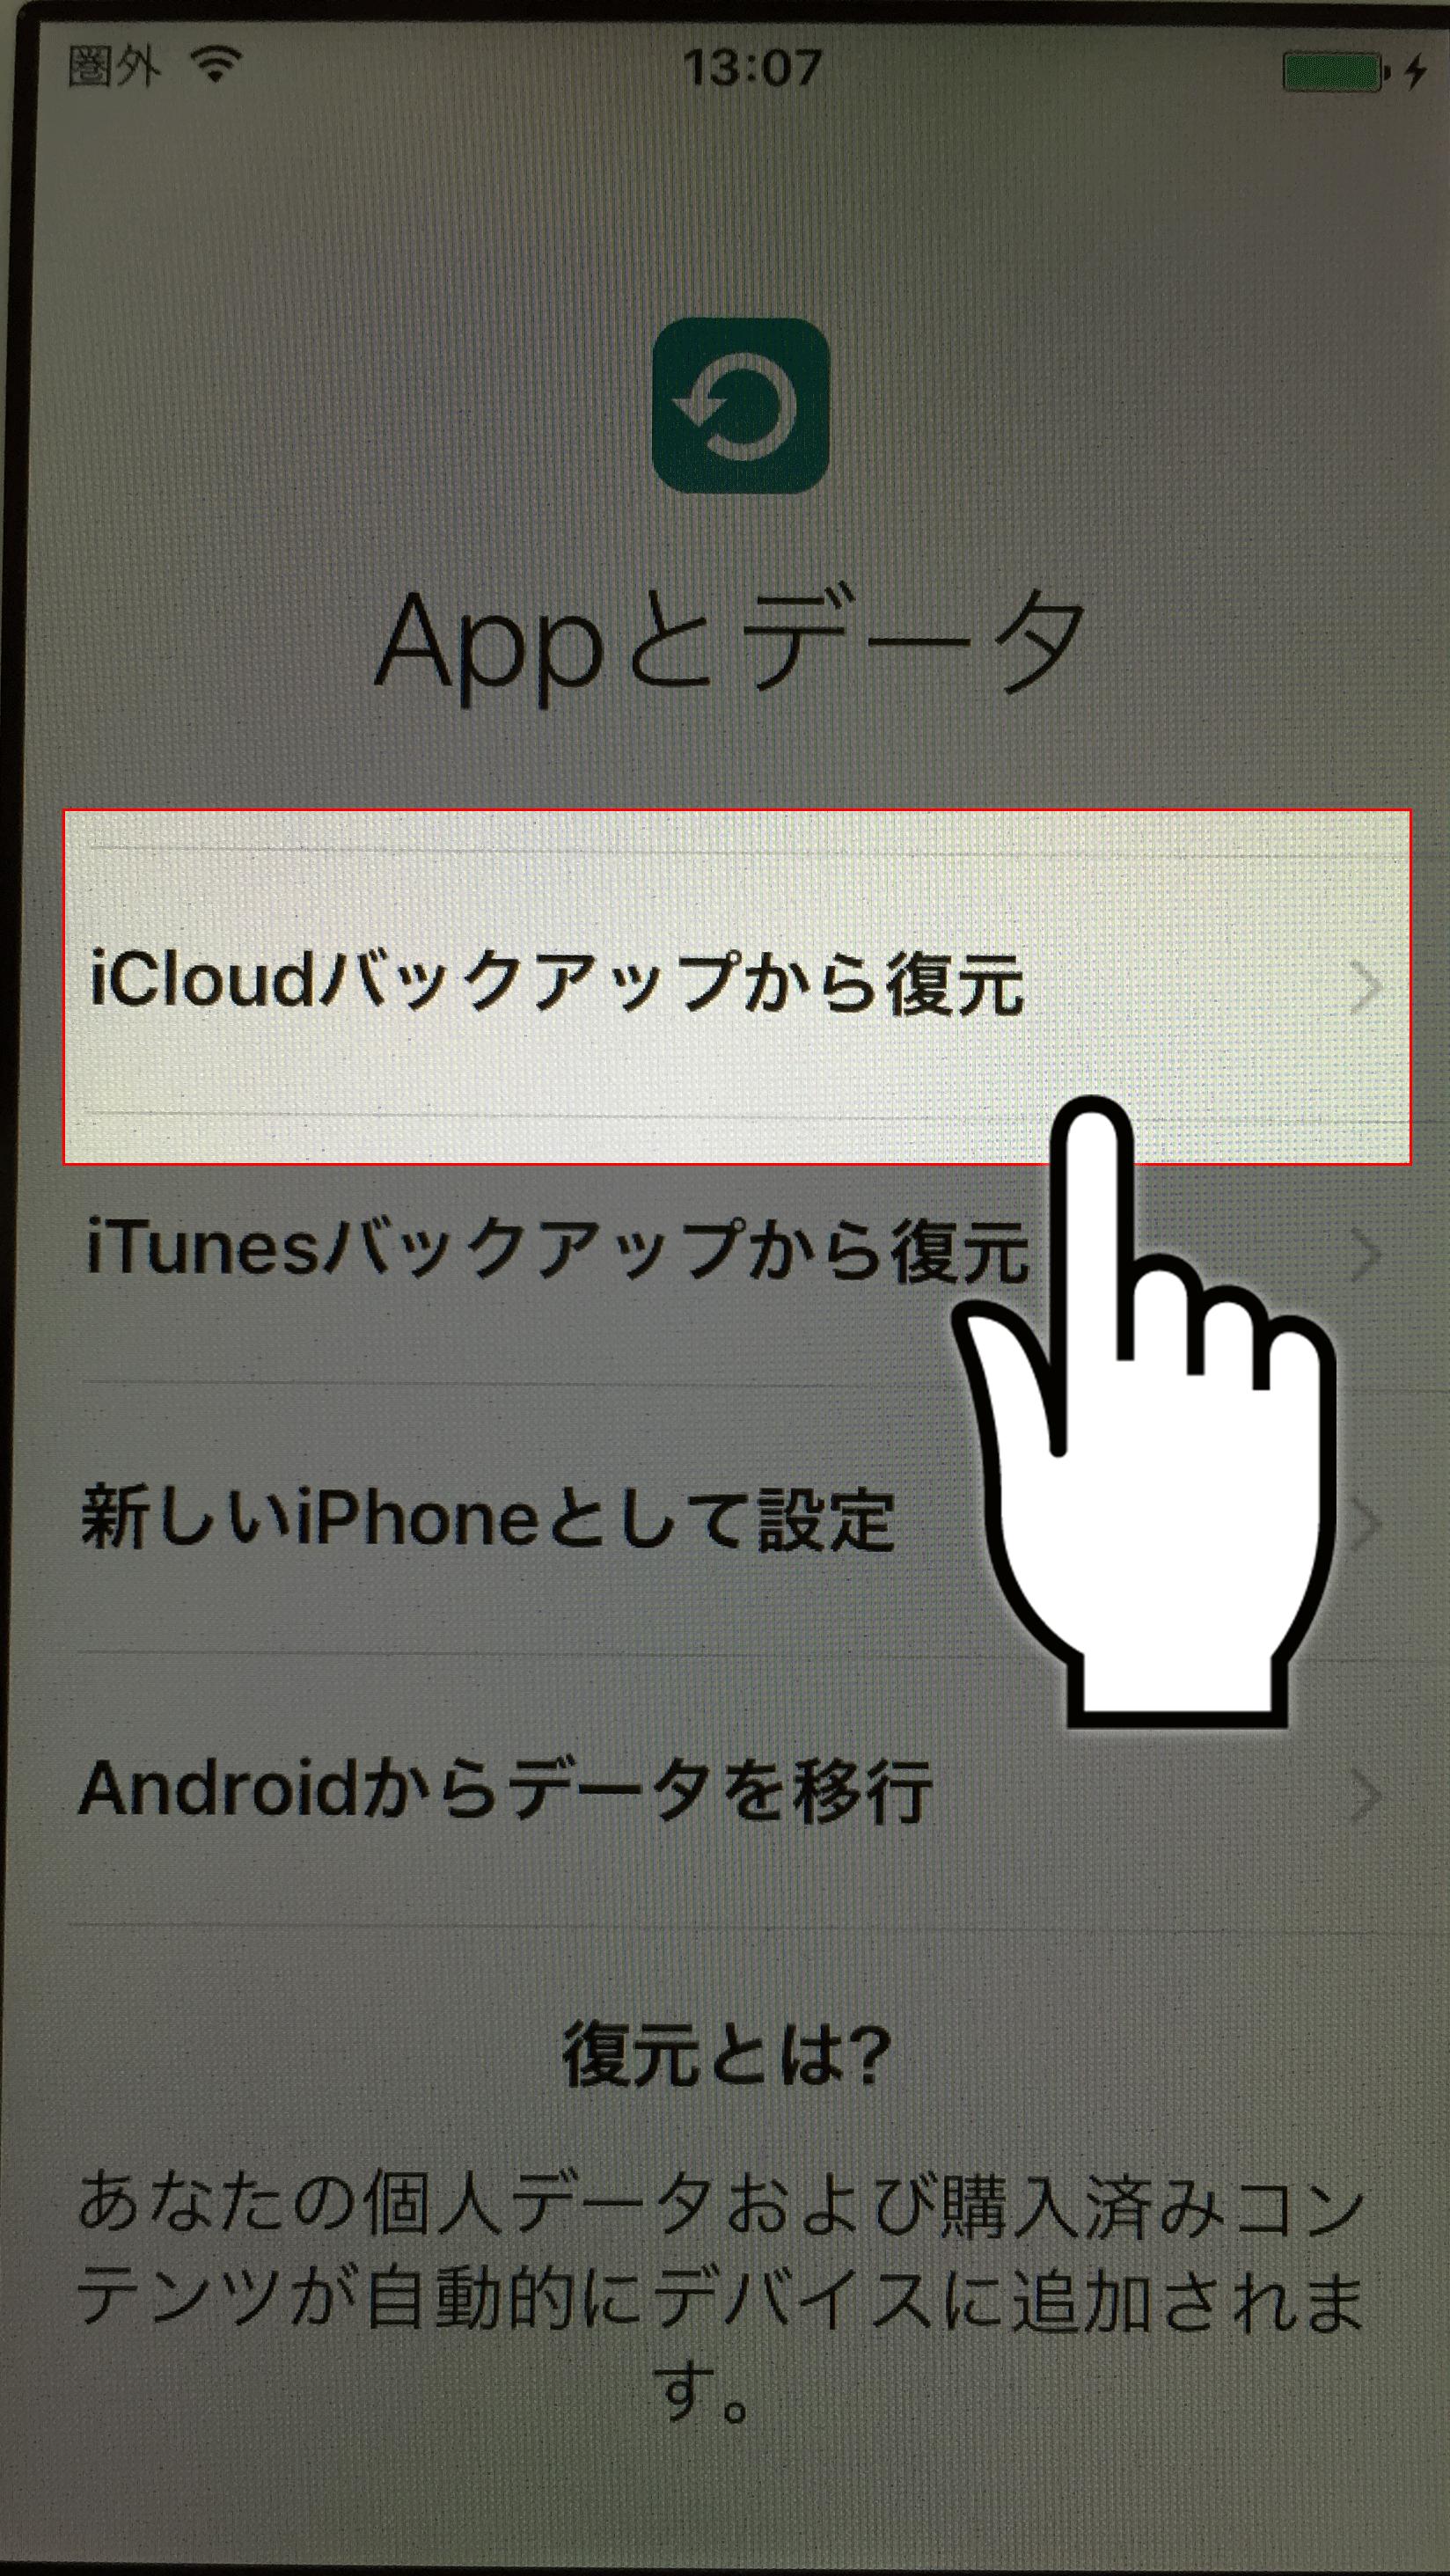 ①『iCloudバックアップから復元』を選択